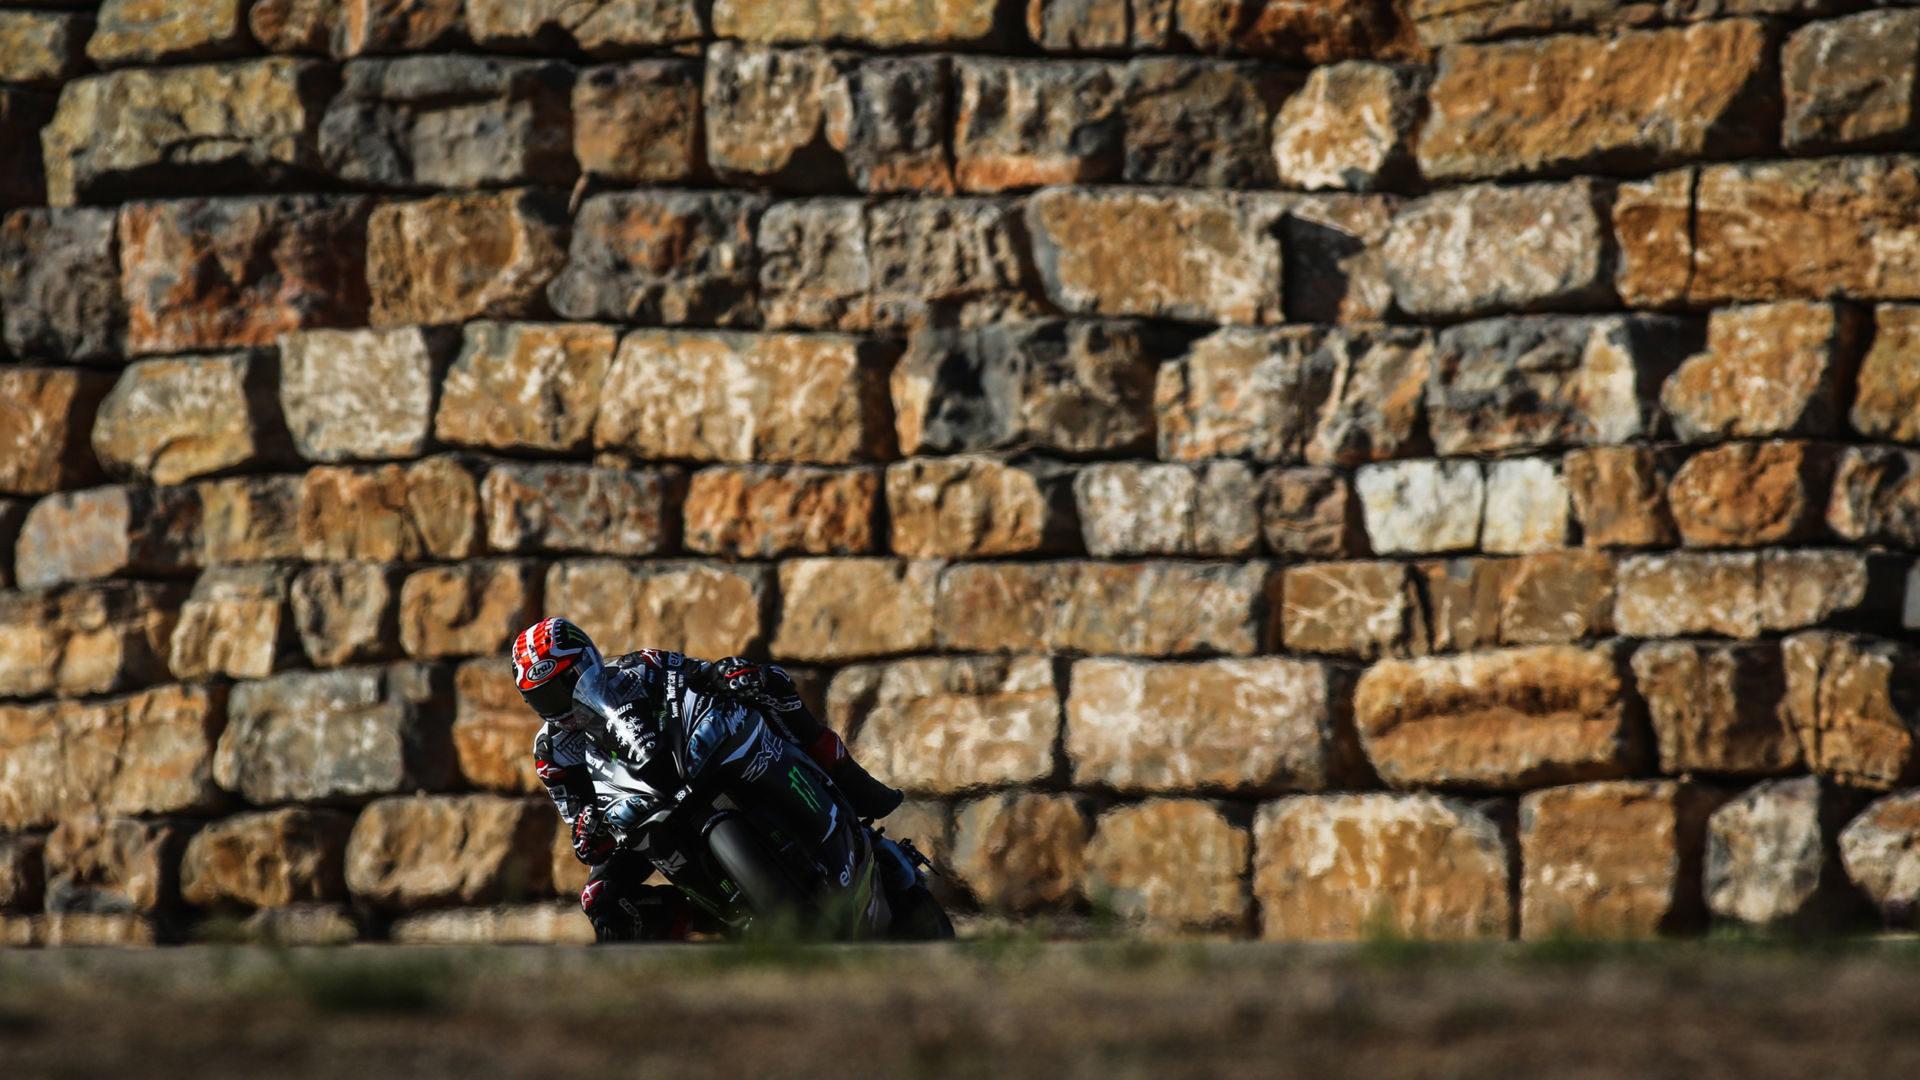 Jonathan Rea in action Wednesday at Motorland Aragon. Photo courtesy of Dorna WorldSBK Press Office.